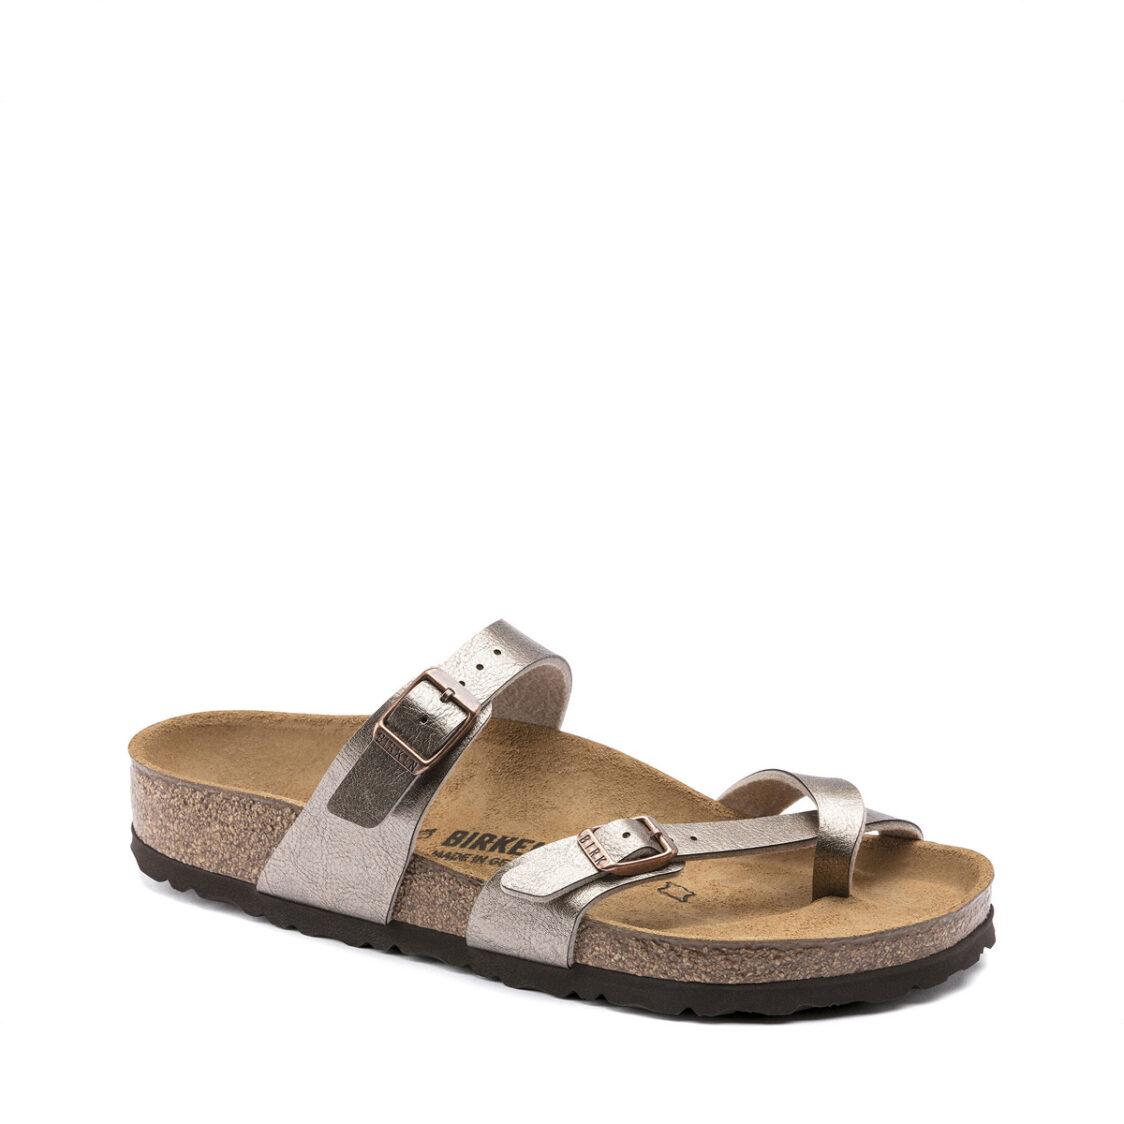 Birkenstock Mayari Birko-Flor Womens Regular Width Sandals Graceful Taupe